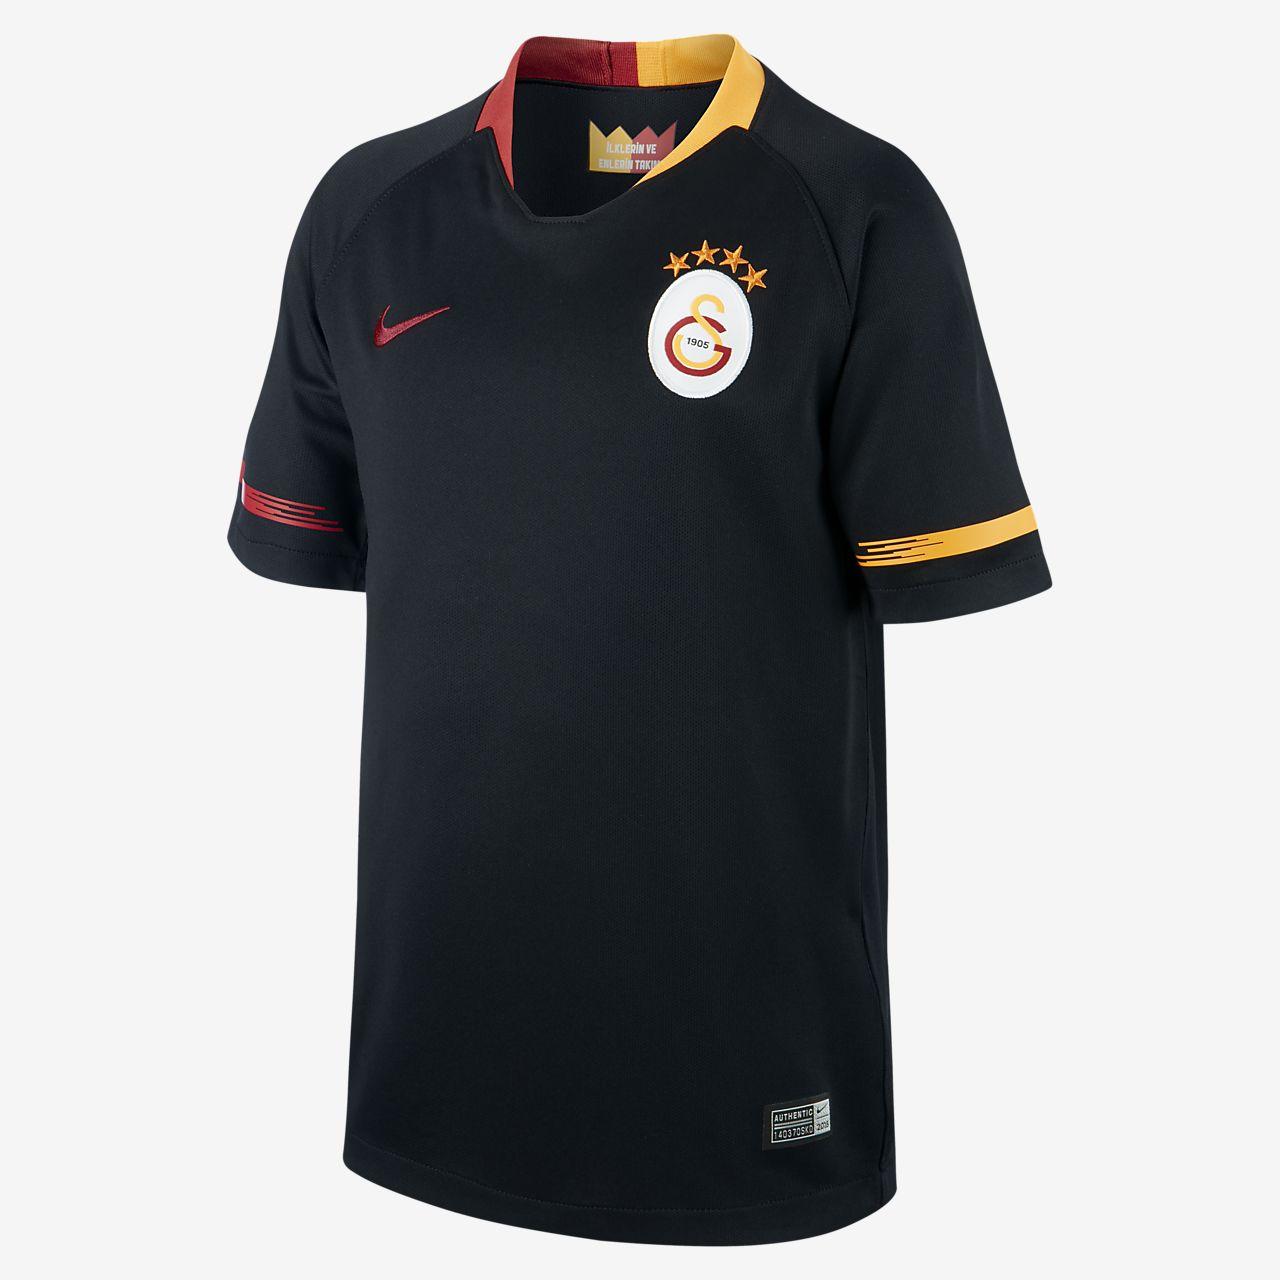 2018/19 Galatasaray S.K. Stadium Away Fußballtrikot für ältere Kinder